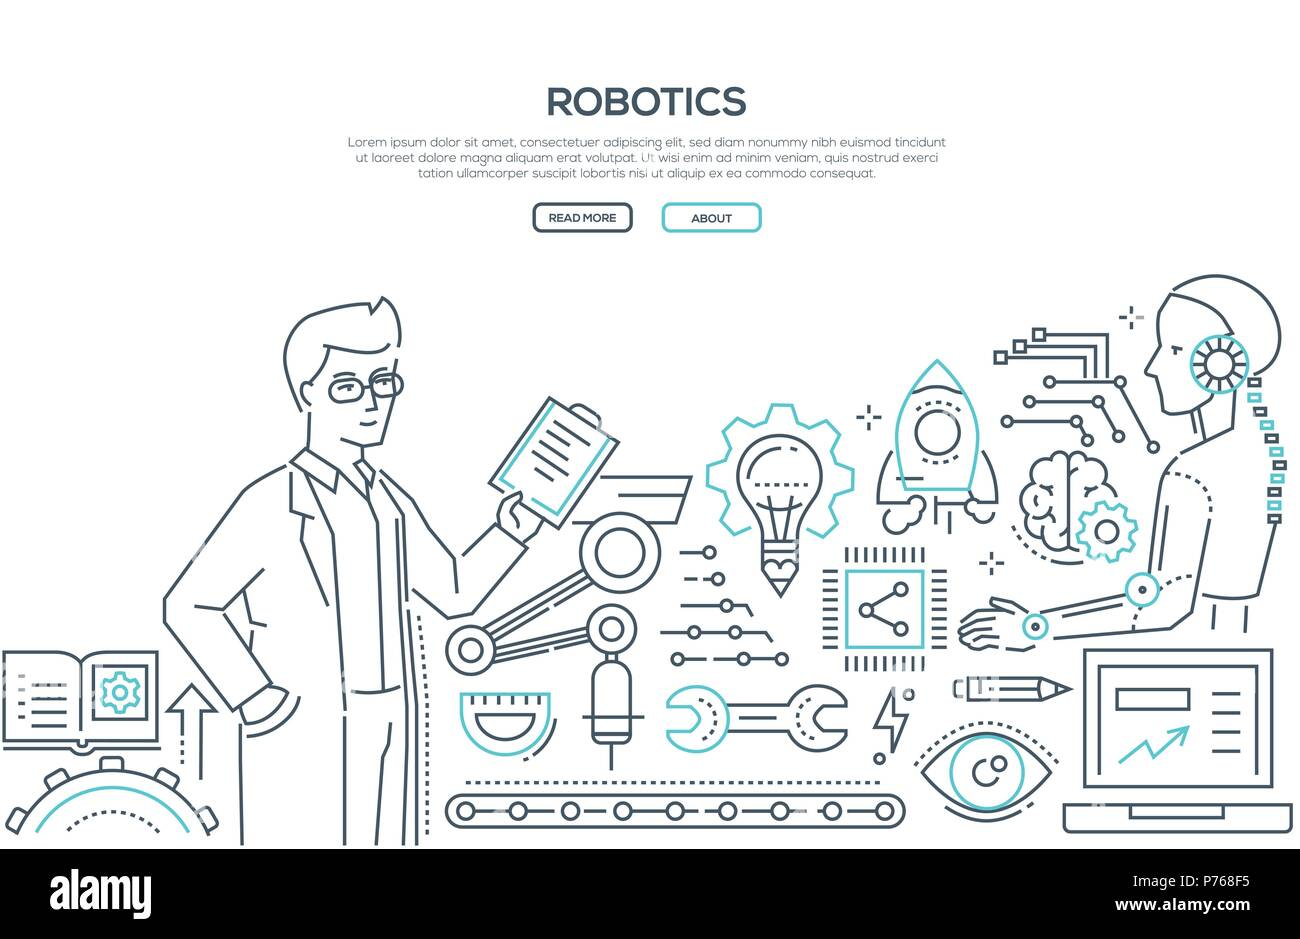 Robotics Line Design Style Illustration On White Background With